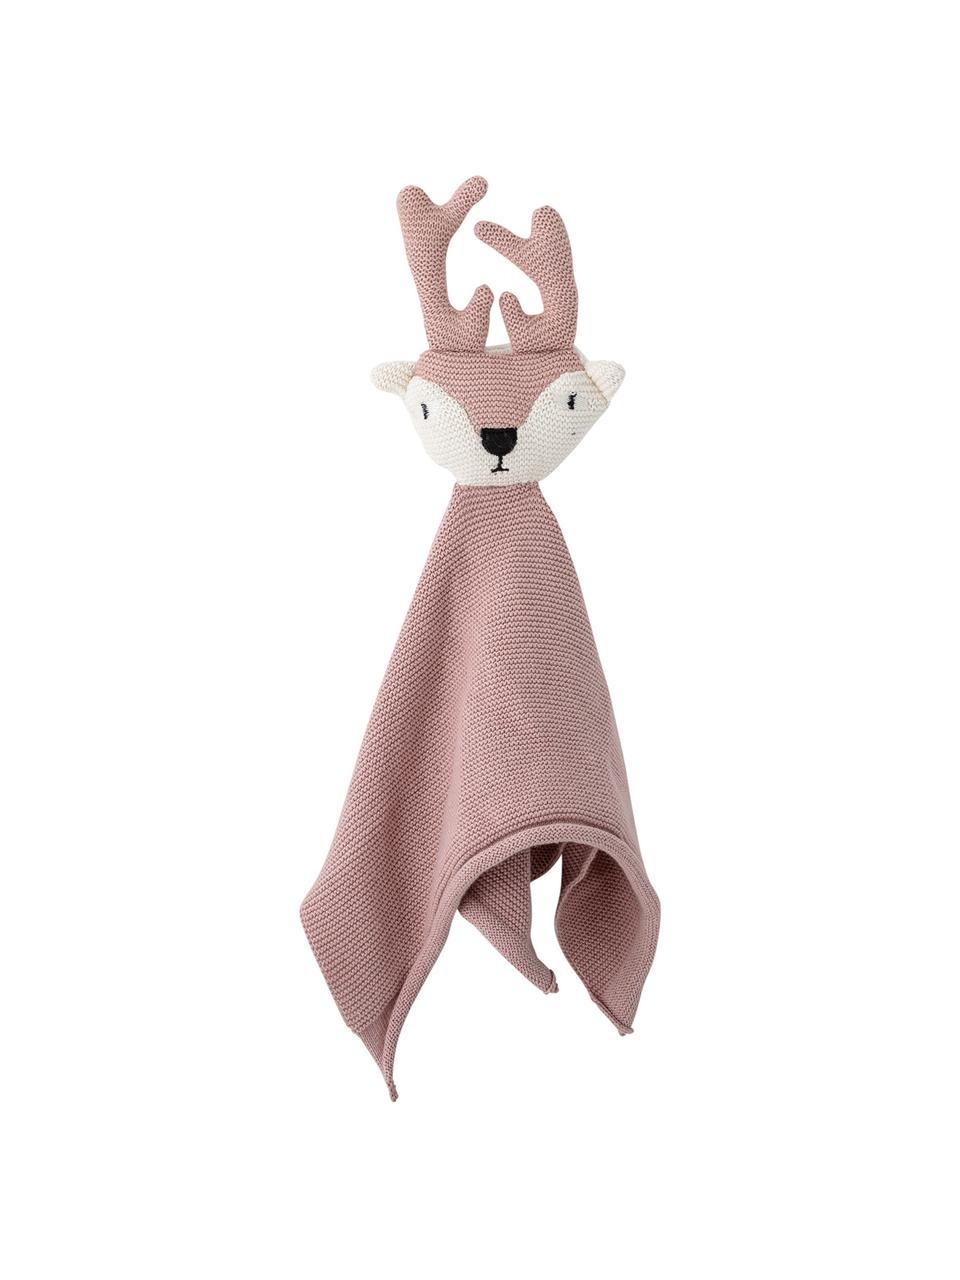 Schmusetuch Deer, Bezug: Baumwolle, Öko-Tex-zertif, Rosa, 30 x 36 cm